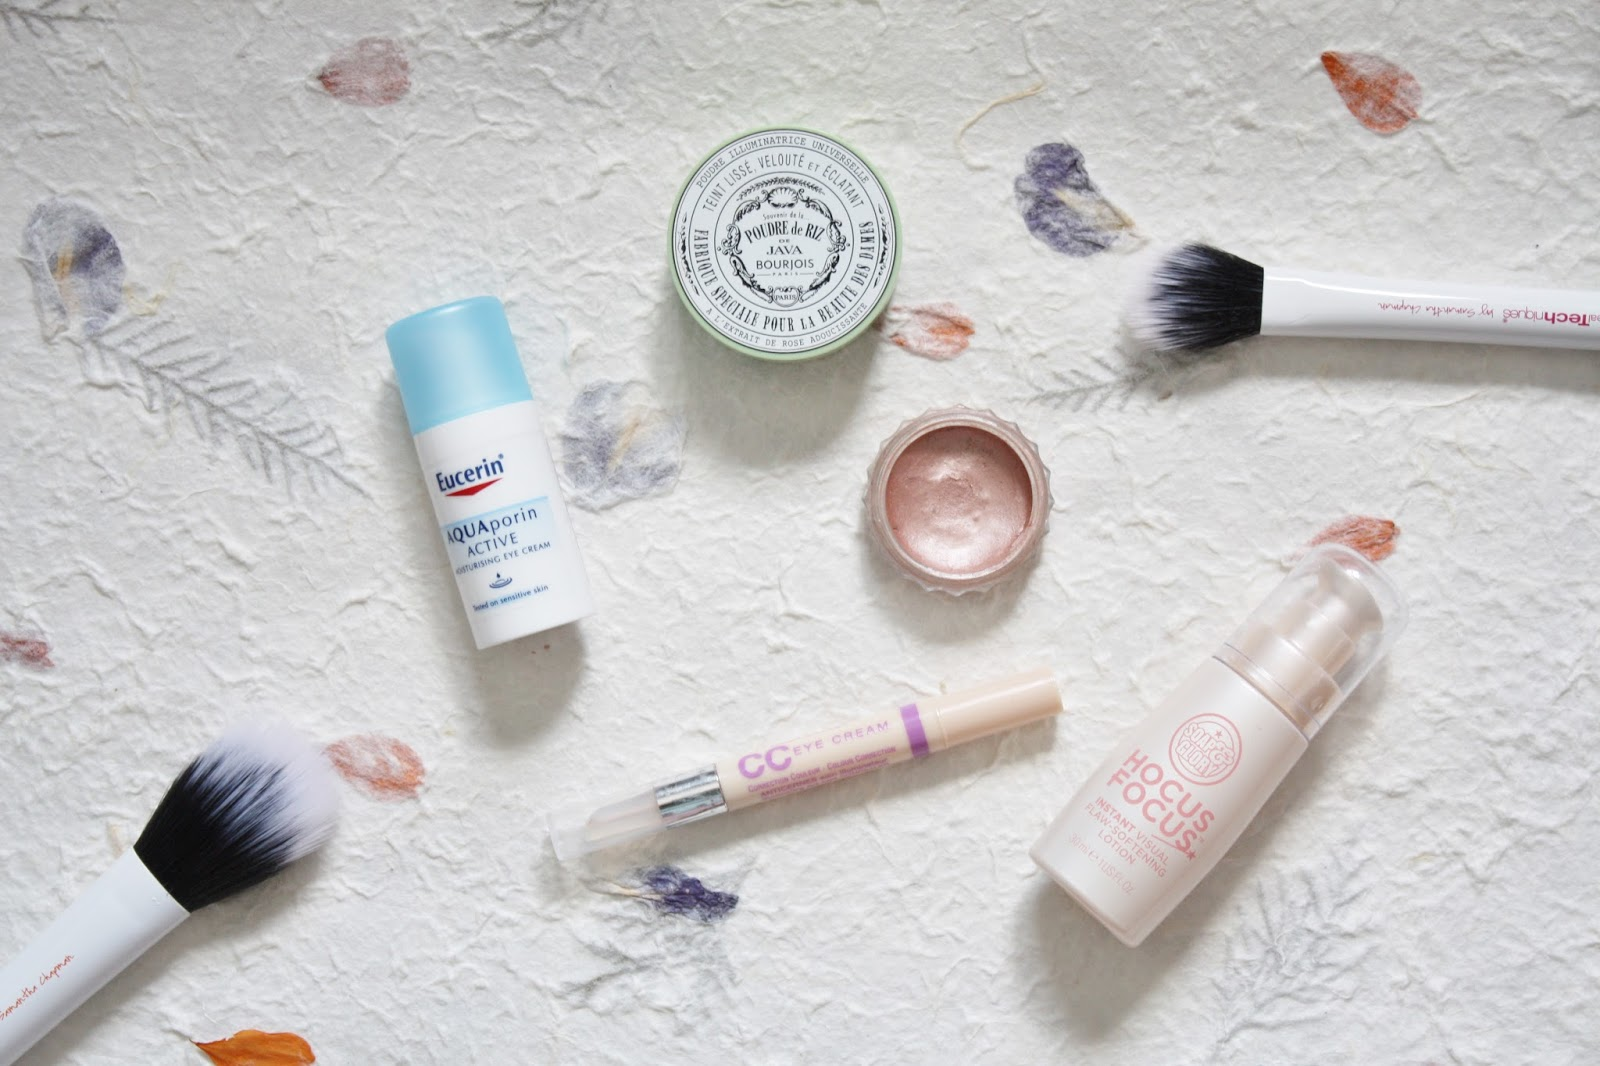 Eye Cream, Bourjois java rice powder, soap and glory hocus focus, bourjois cc eye cream, benefit cream shadow rsvp